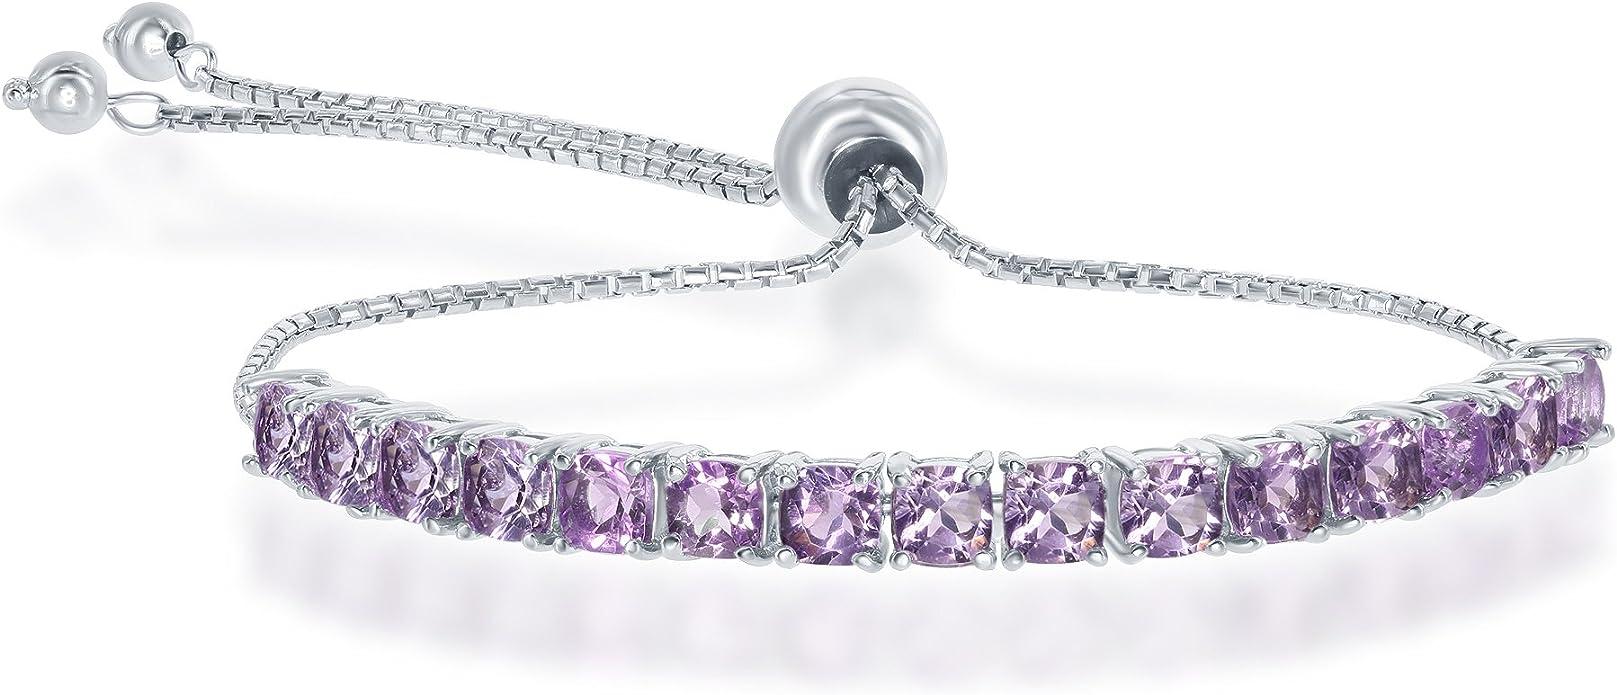 Bridesmaid Gift Bezel Setting Bracelet AAA New Trendy Amazonite Gemstone Bracelet Beautiful Tennis Bracelet Amazonite Jewelry Love Gift